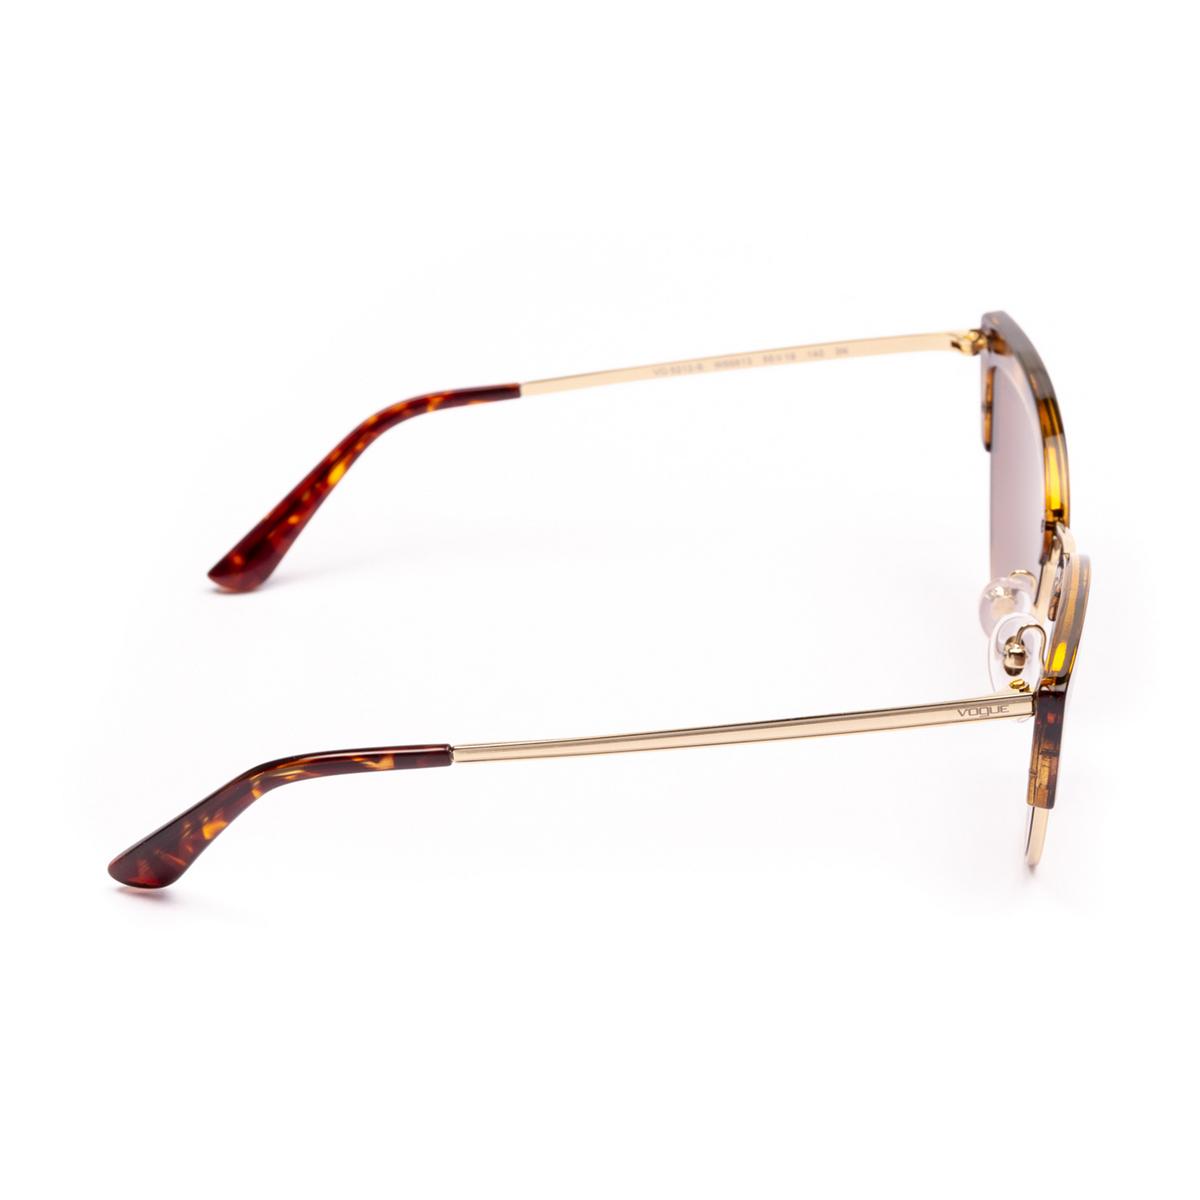 Vogue® Cat-eye Sunglasses: VO5212S color Top Dark Havana / Pale Gold W65613 - 4/4.